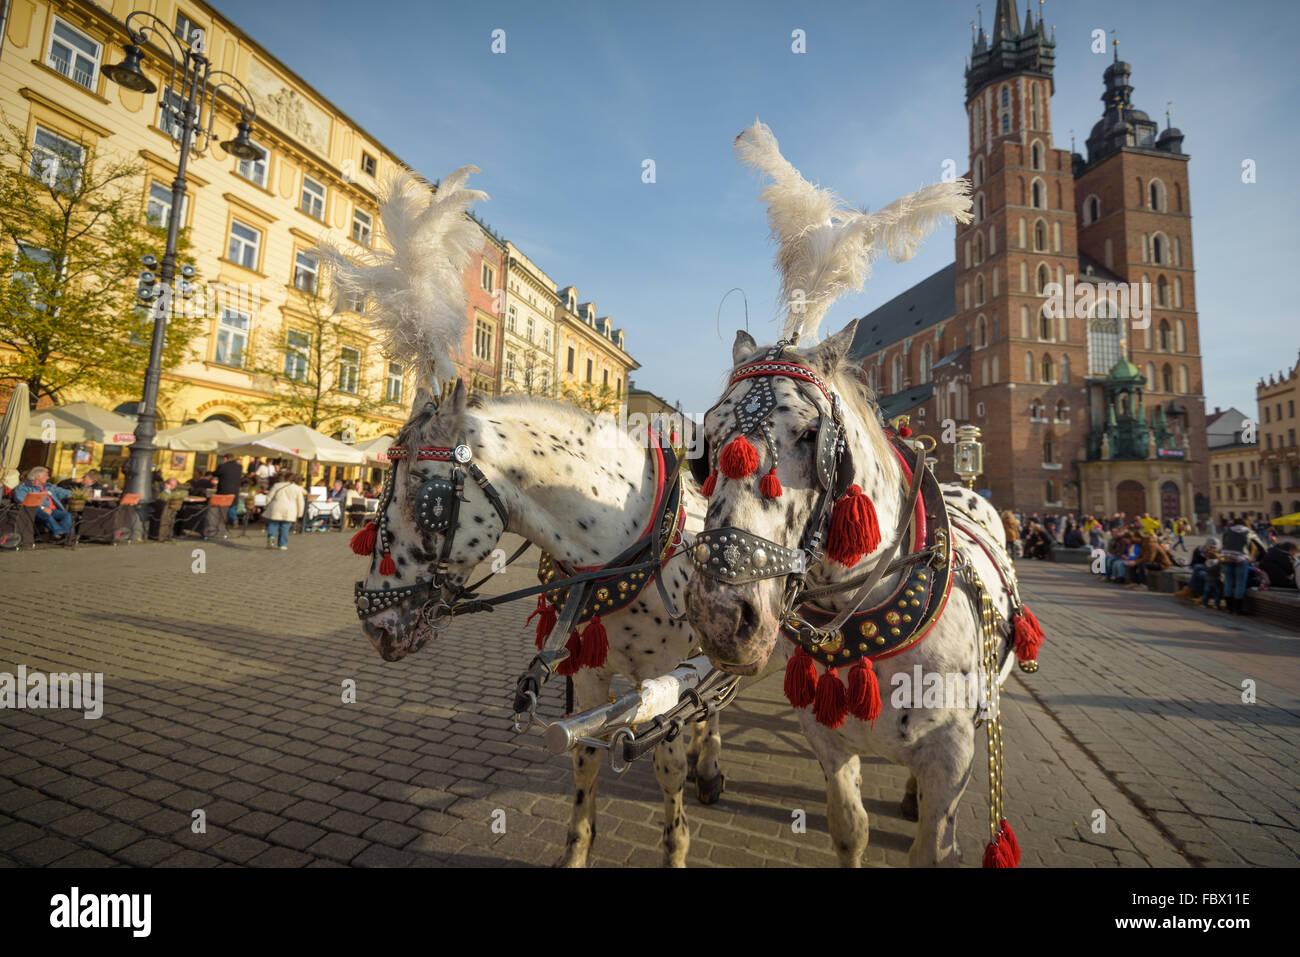 Krakau, Polen - 13. November 2015: Kutschen am Hauptplatz in Krakau in einem Herbsttag, Polen am 13. November 2015 Stockbild